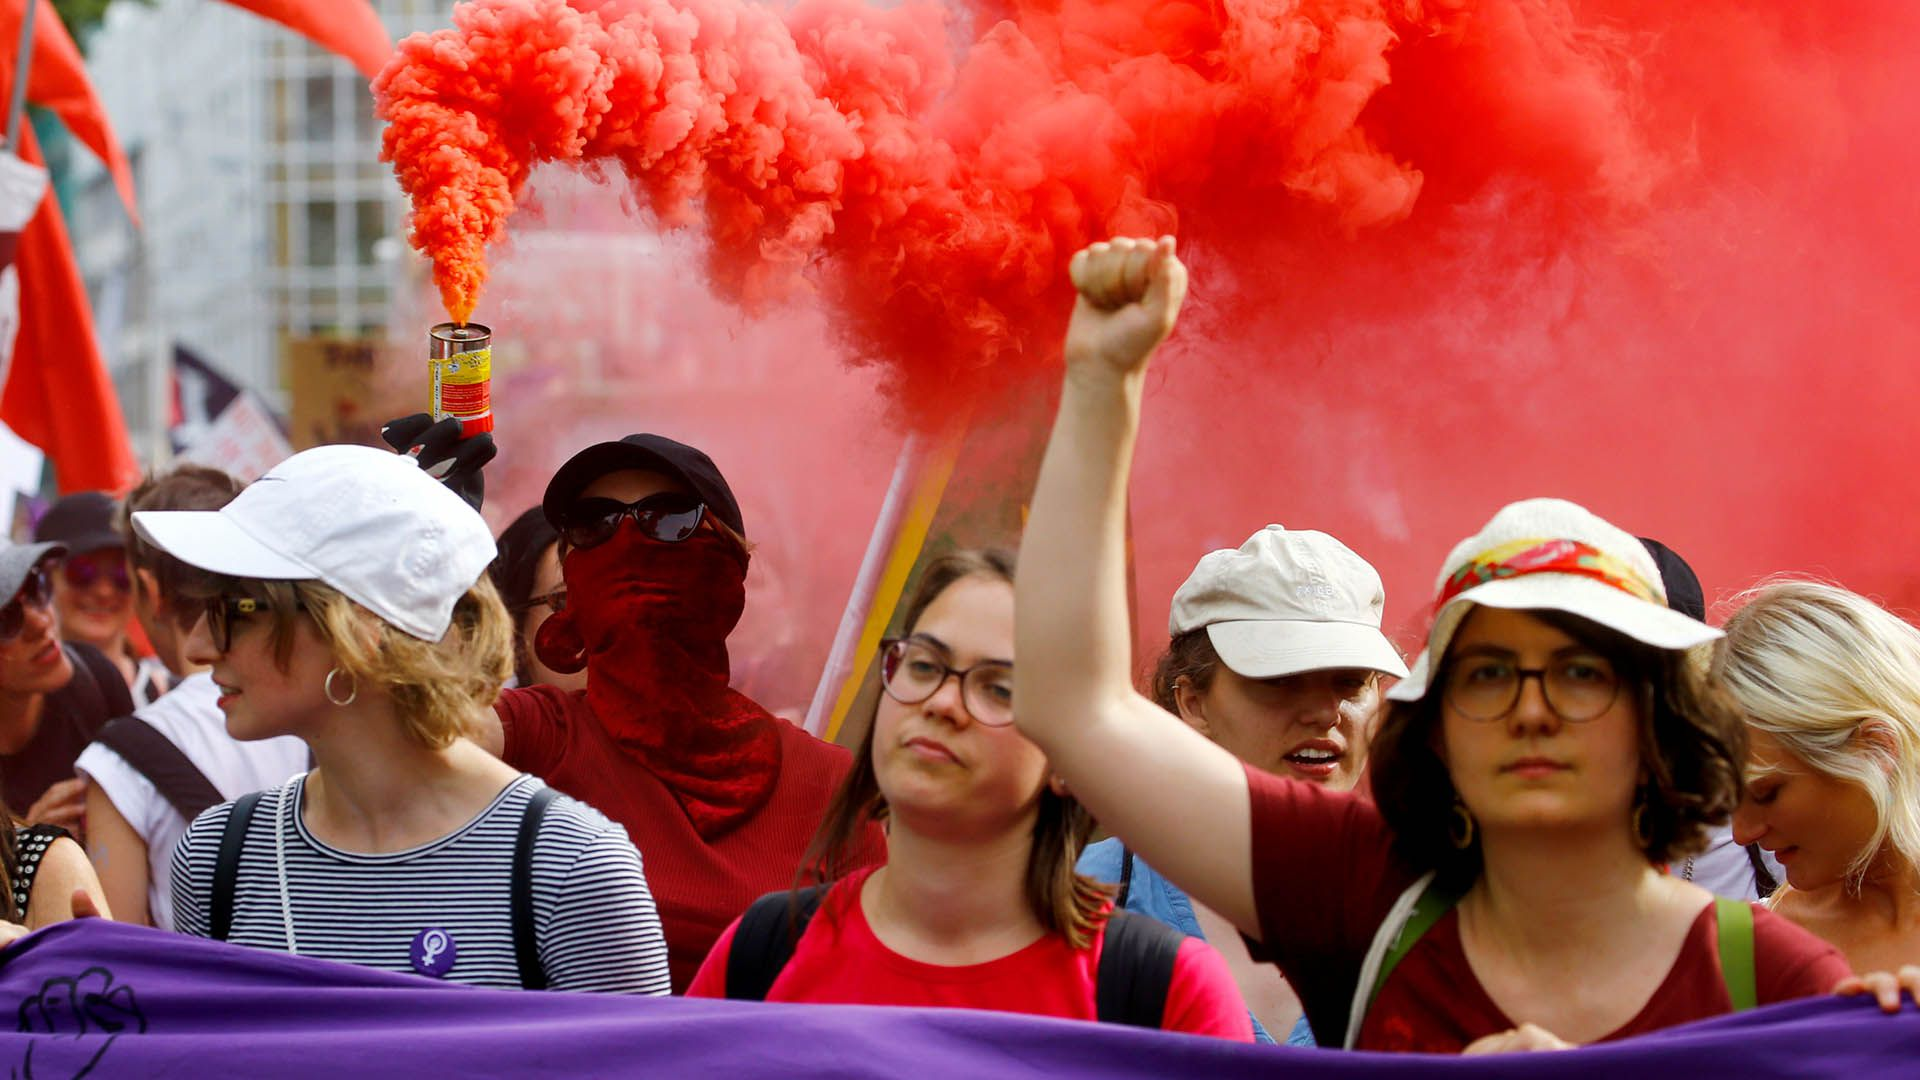 Miles de mujeres se manifestaron en Zúrich, Suiza(REUTERS/Arnd Wiegmann)